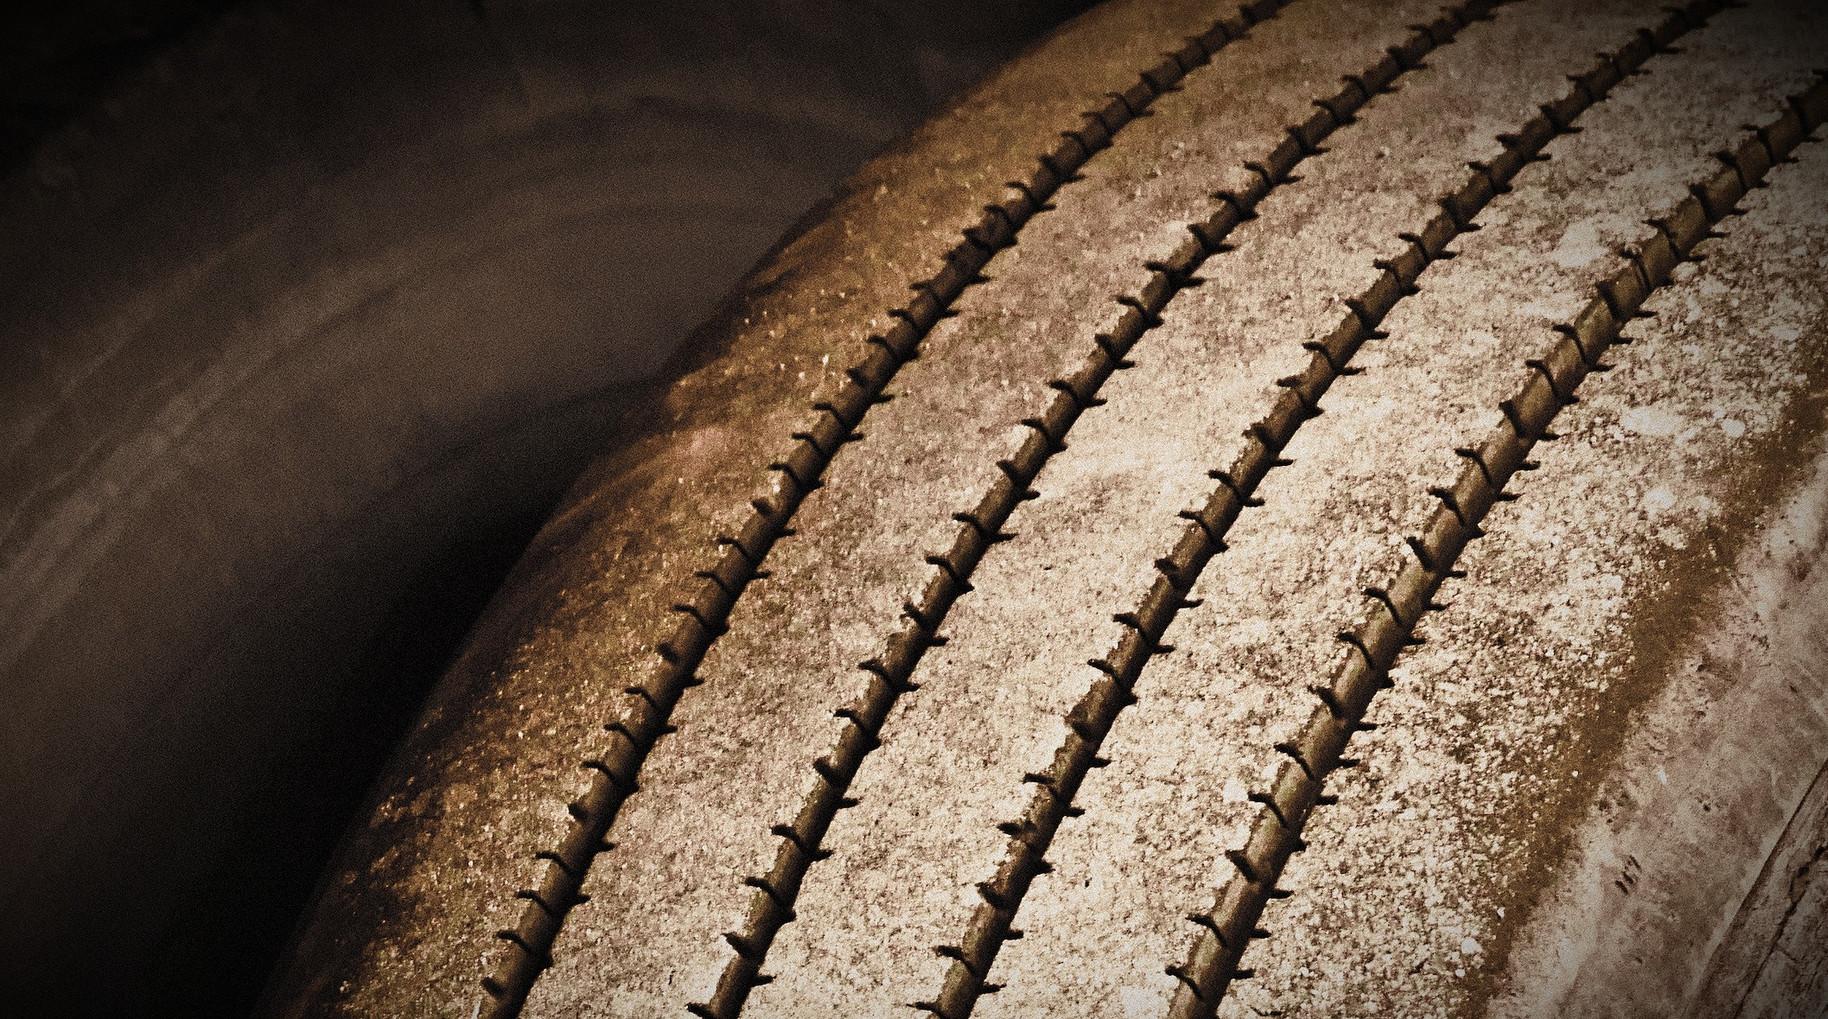 209-tires_edited.jpg